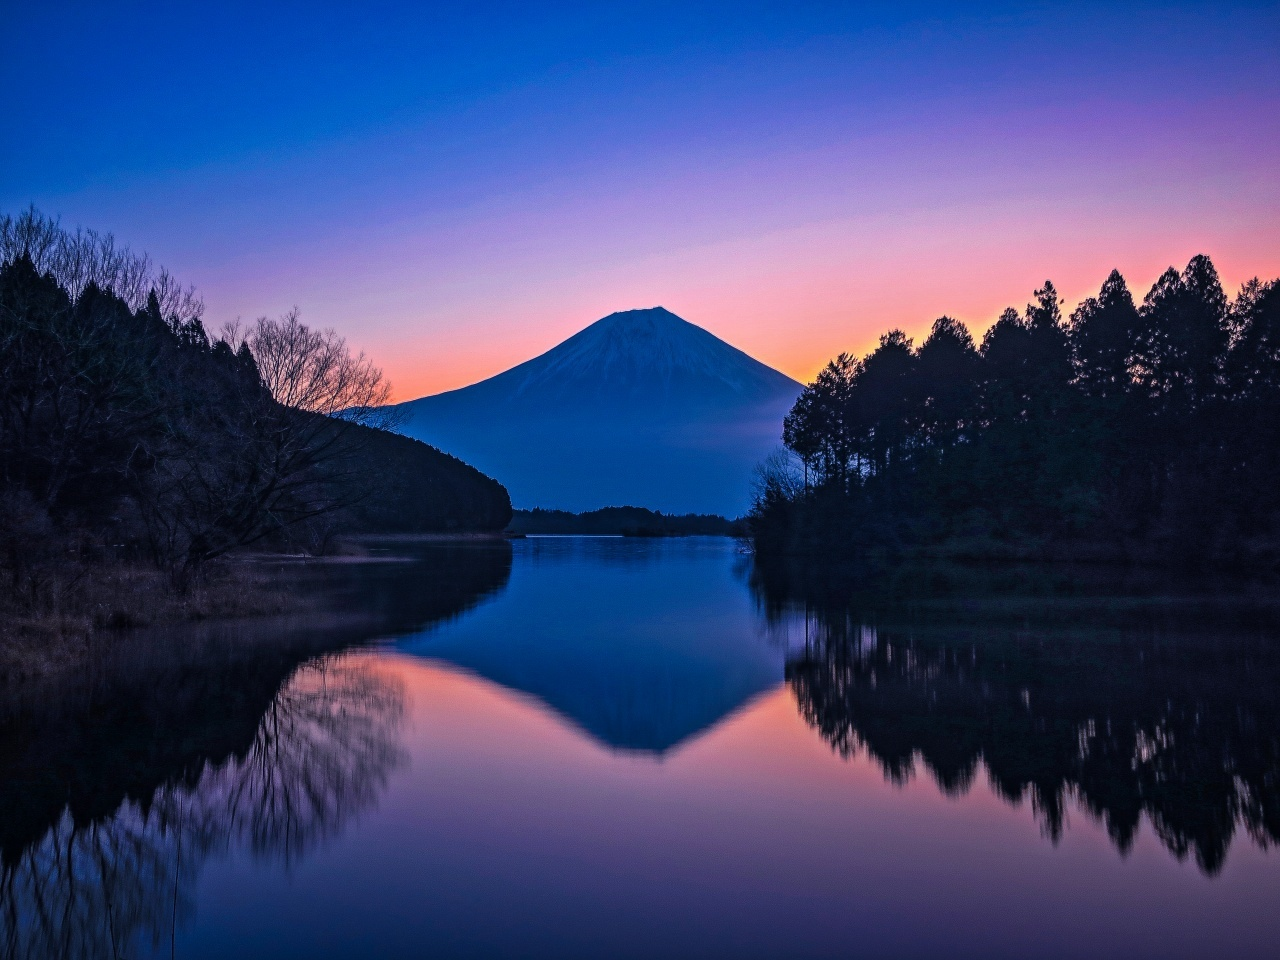 2020.2.21逆さ富士(田貫湖)_e0321032_16400666.jpg